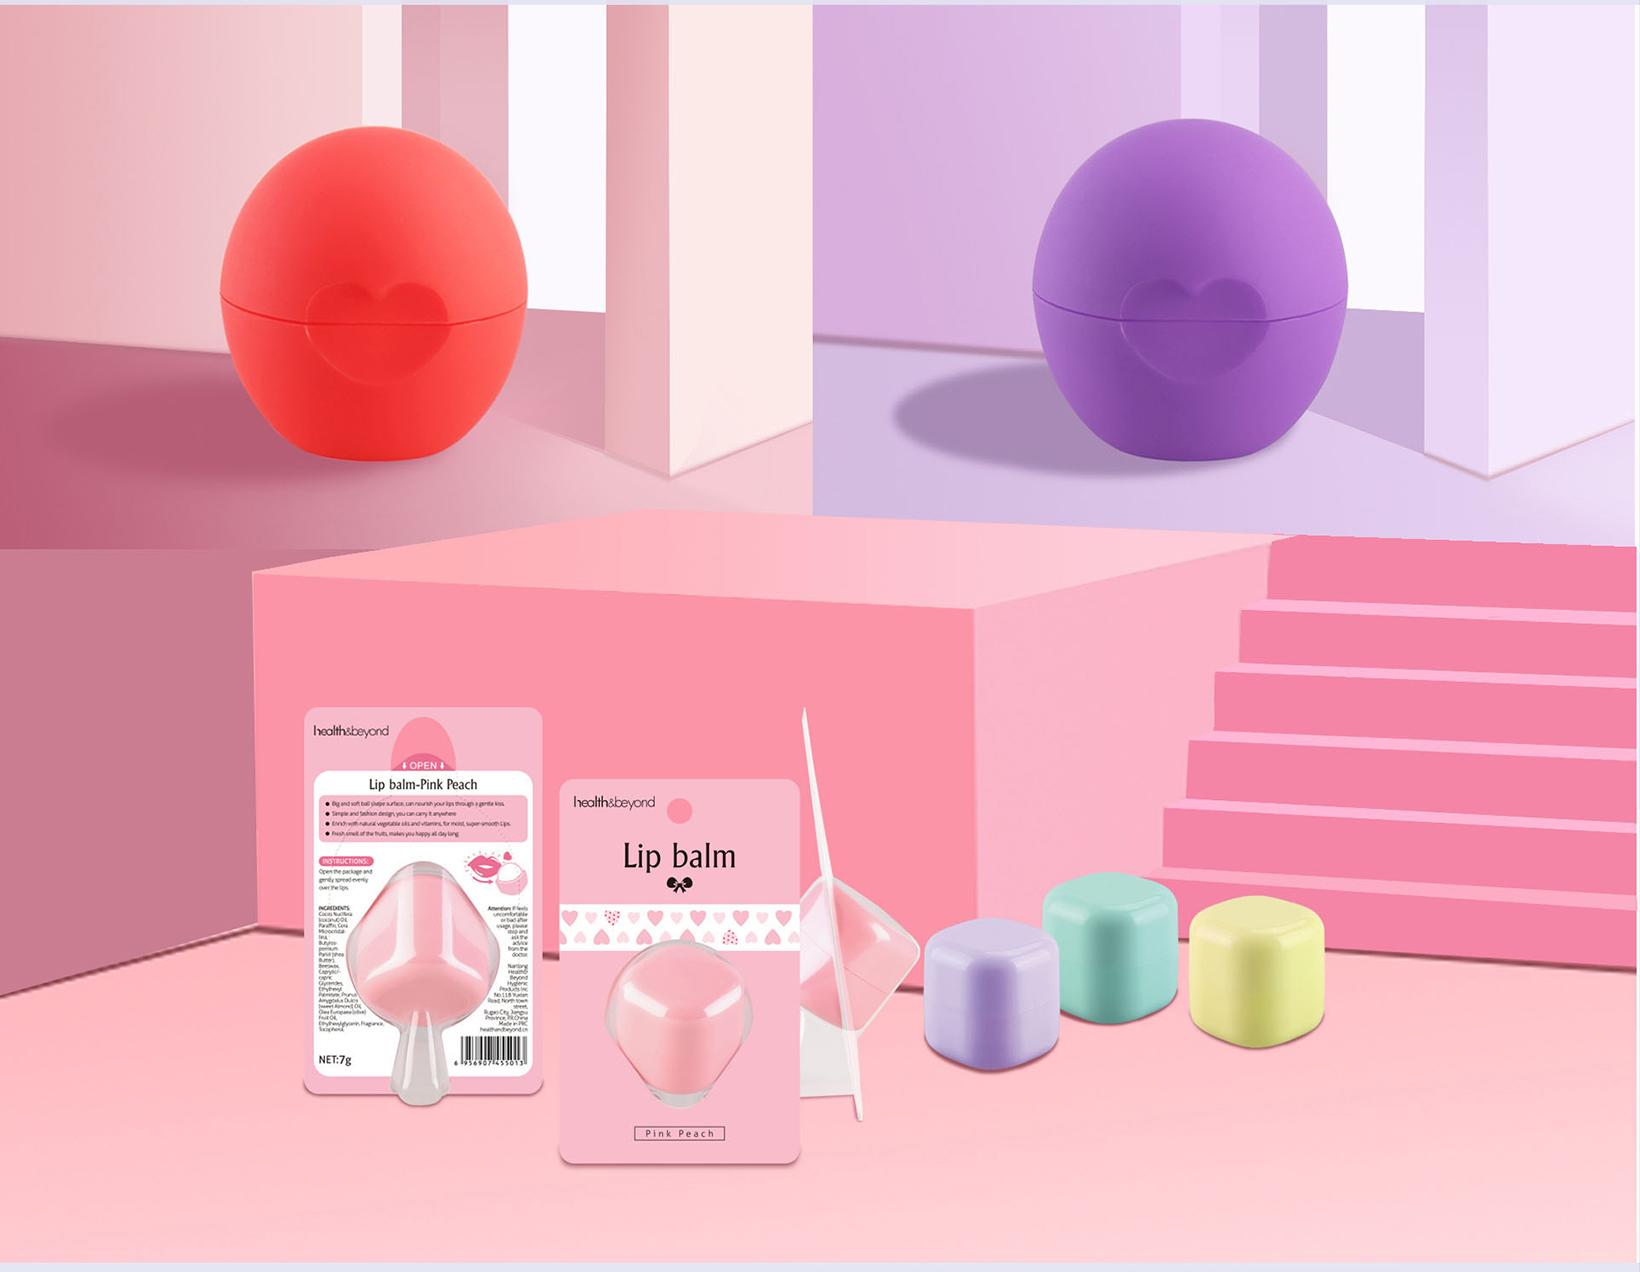 Maximize the use of endless lip balm